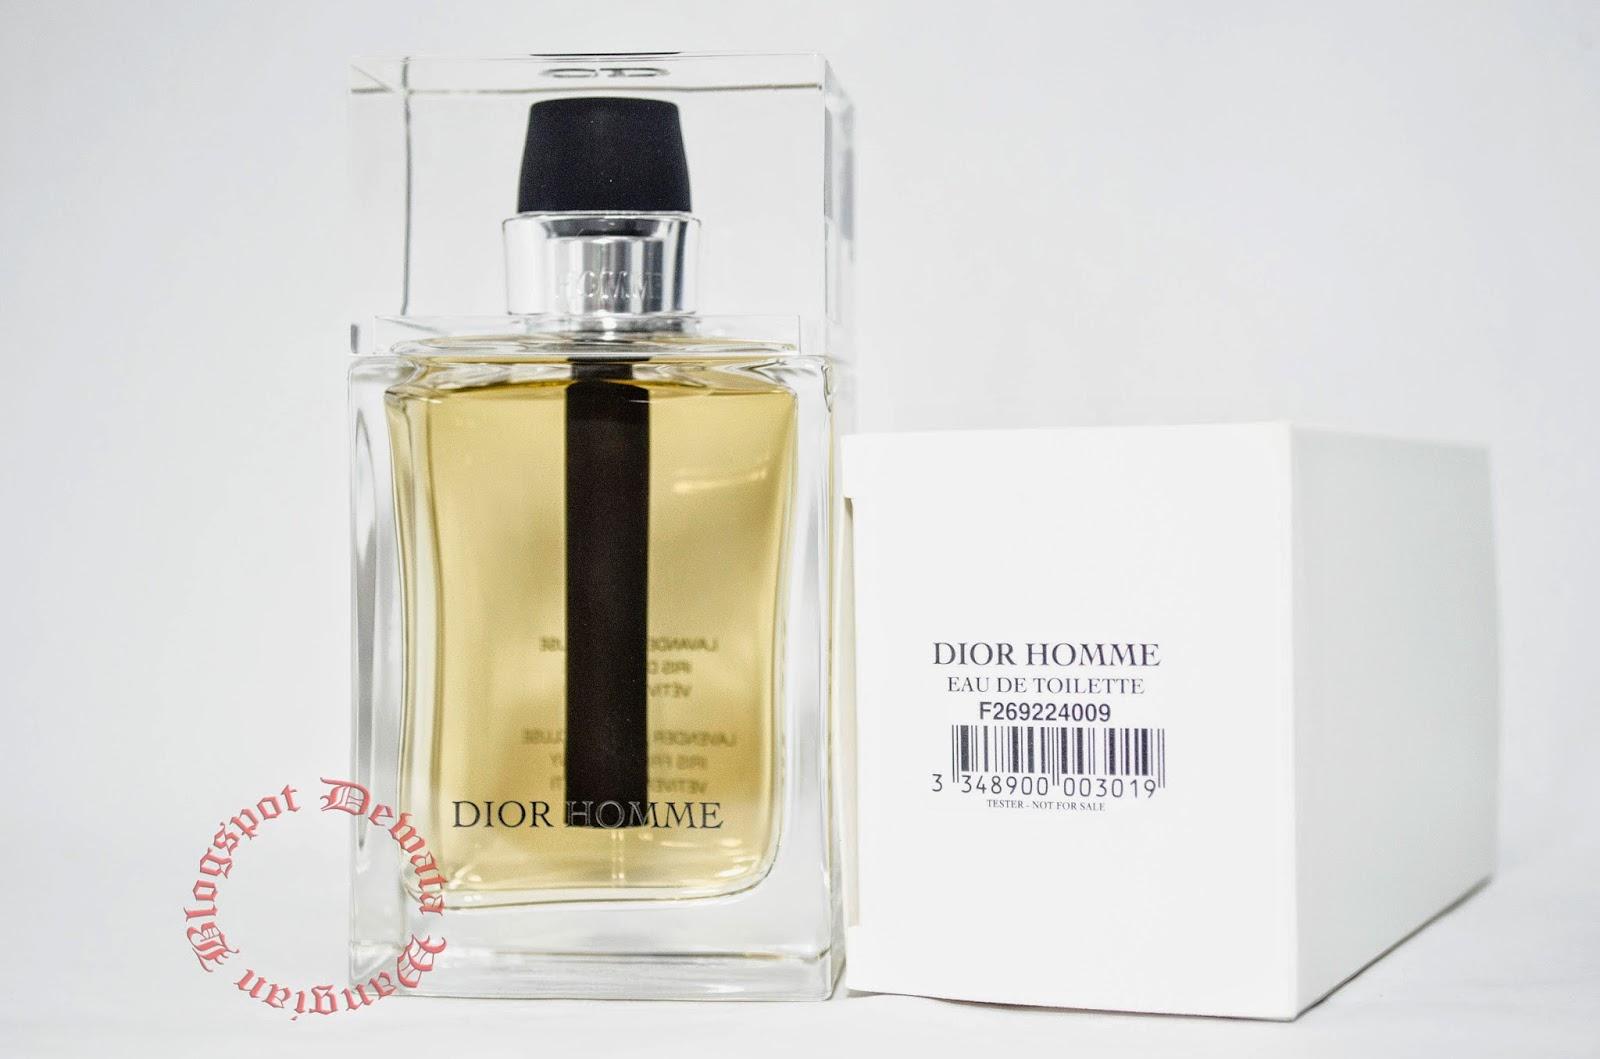 Christian Dior Homme Tester Perfume